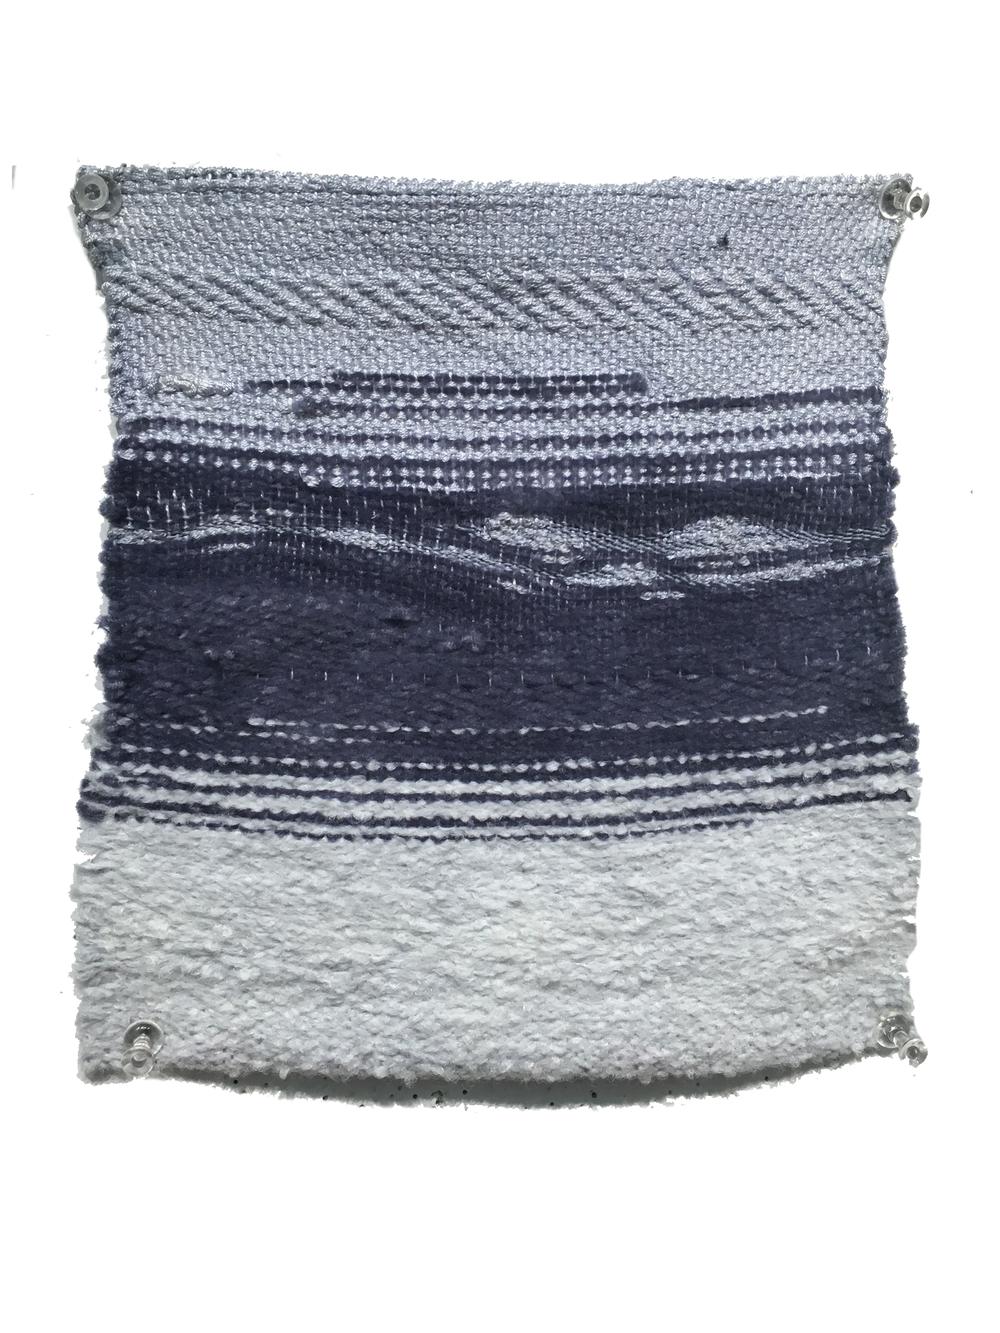 weaving1sample8.jpg